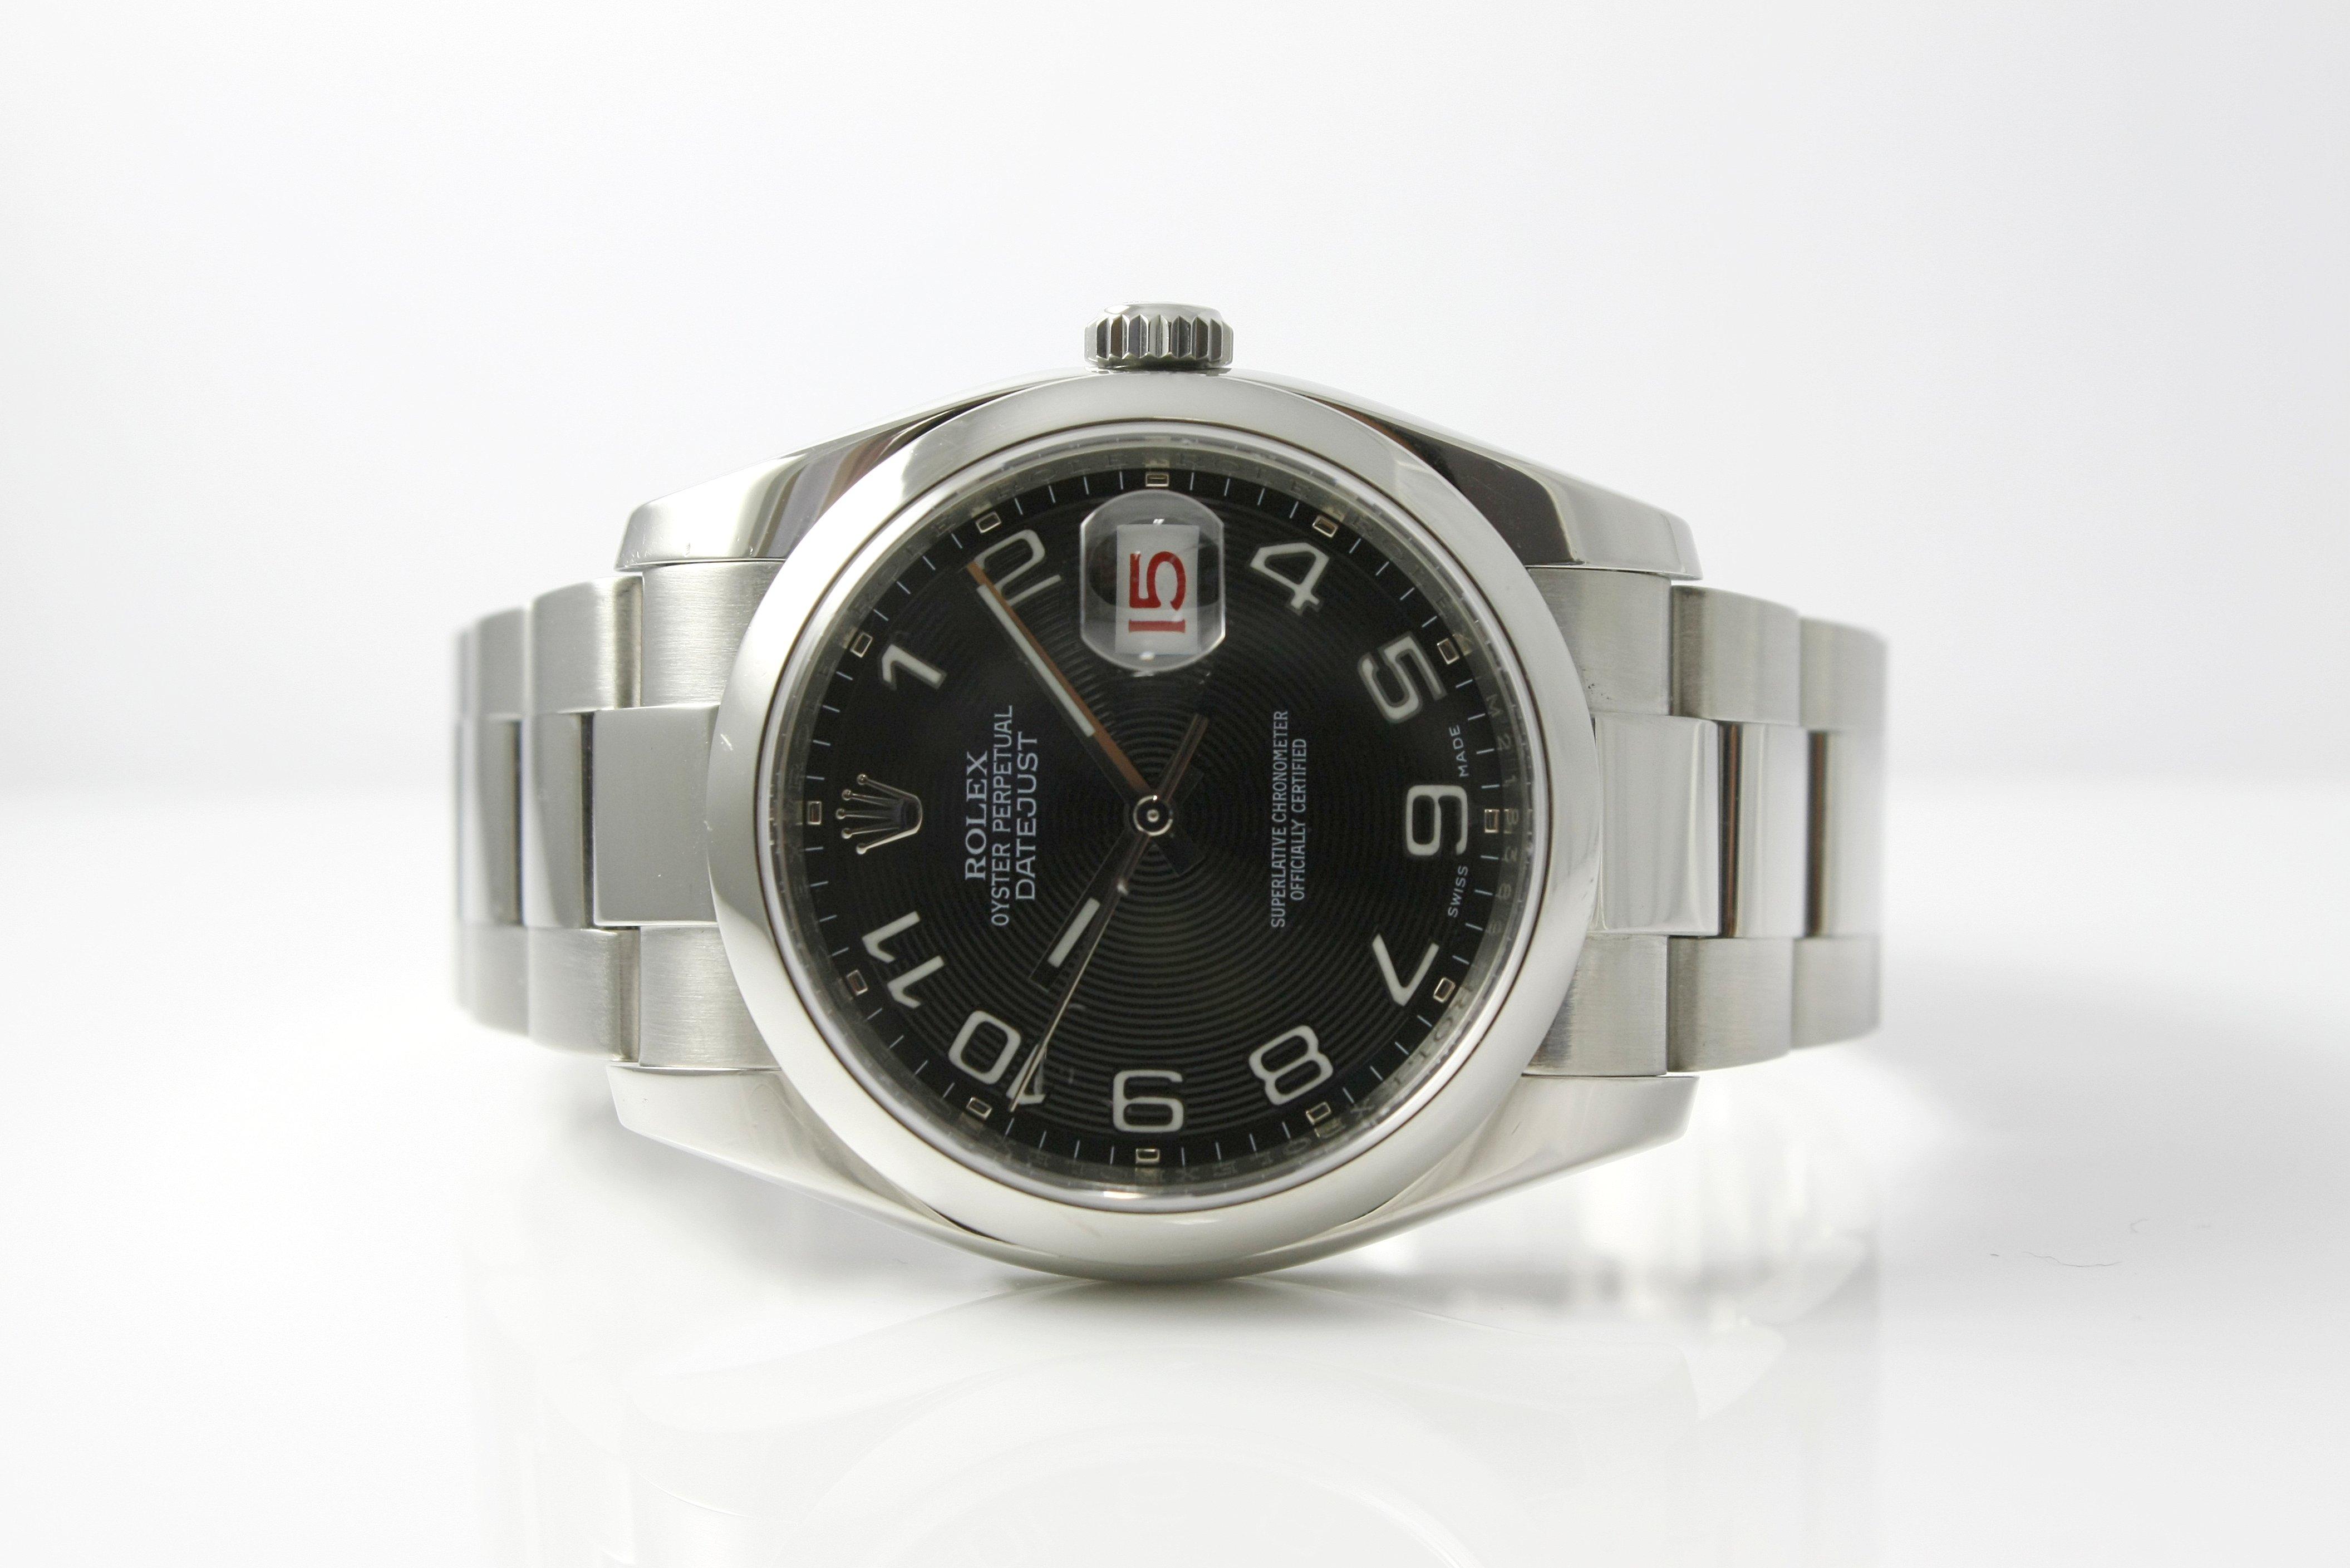 Rolex Datejust - $4,000